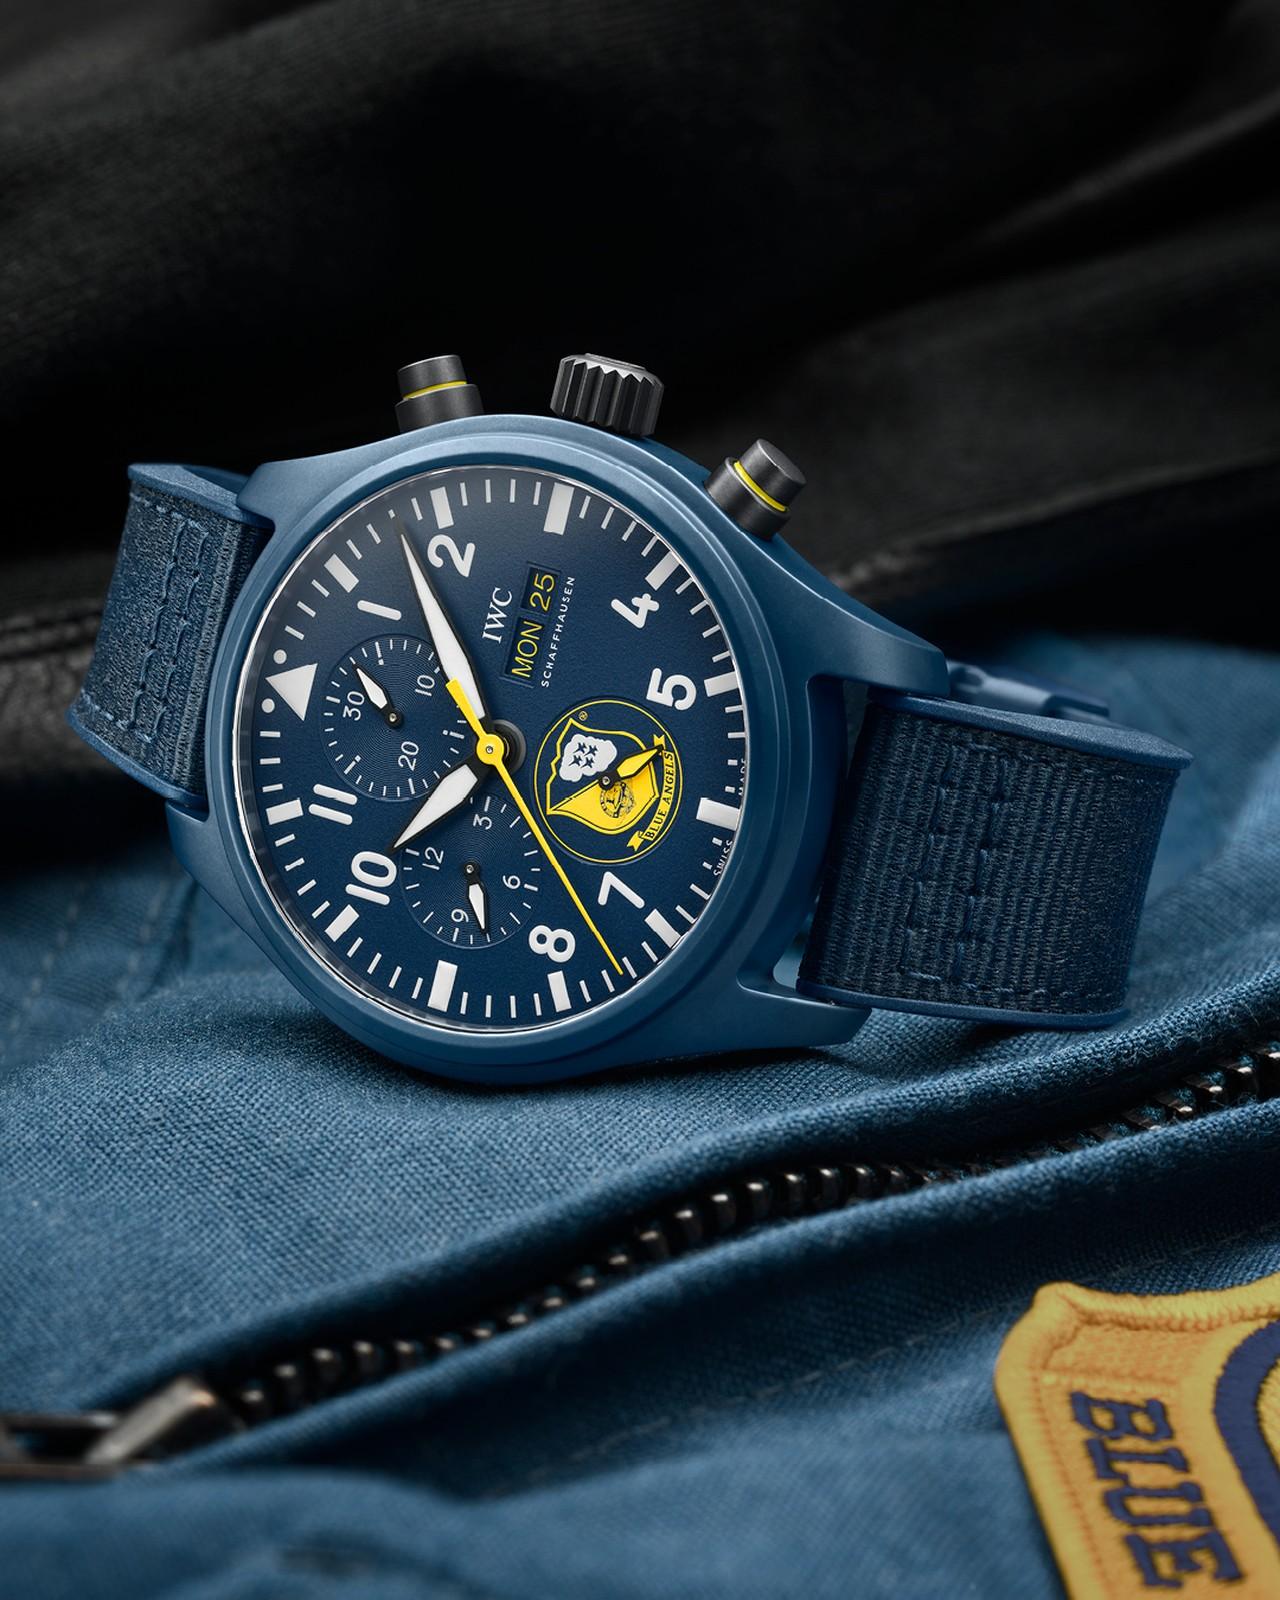 IWC Pilot's Watch Chronograph U.S. Navy Squadrons Editions - Blue Angels műrepülő kötelék órája